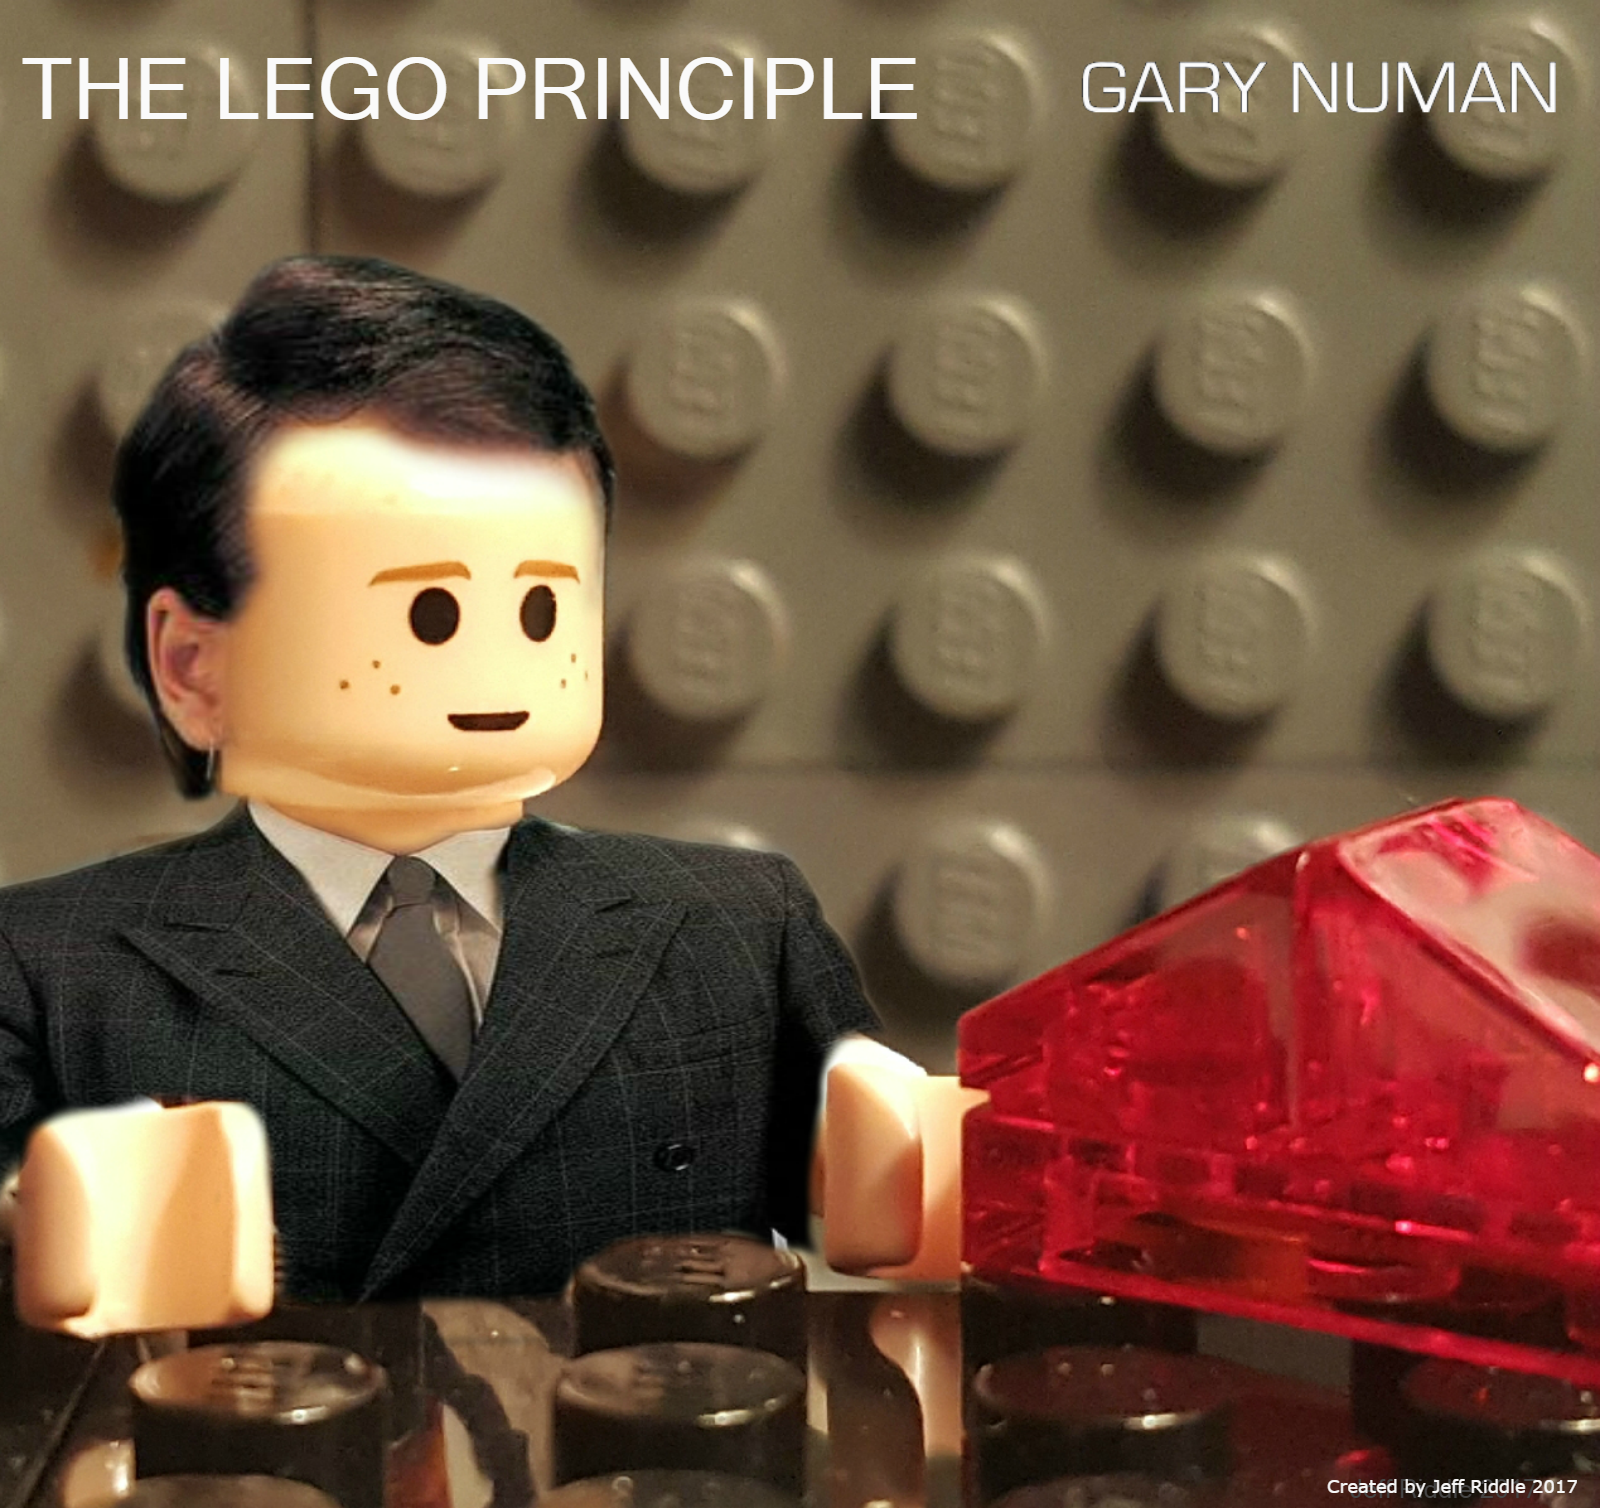 Lego Numan